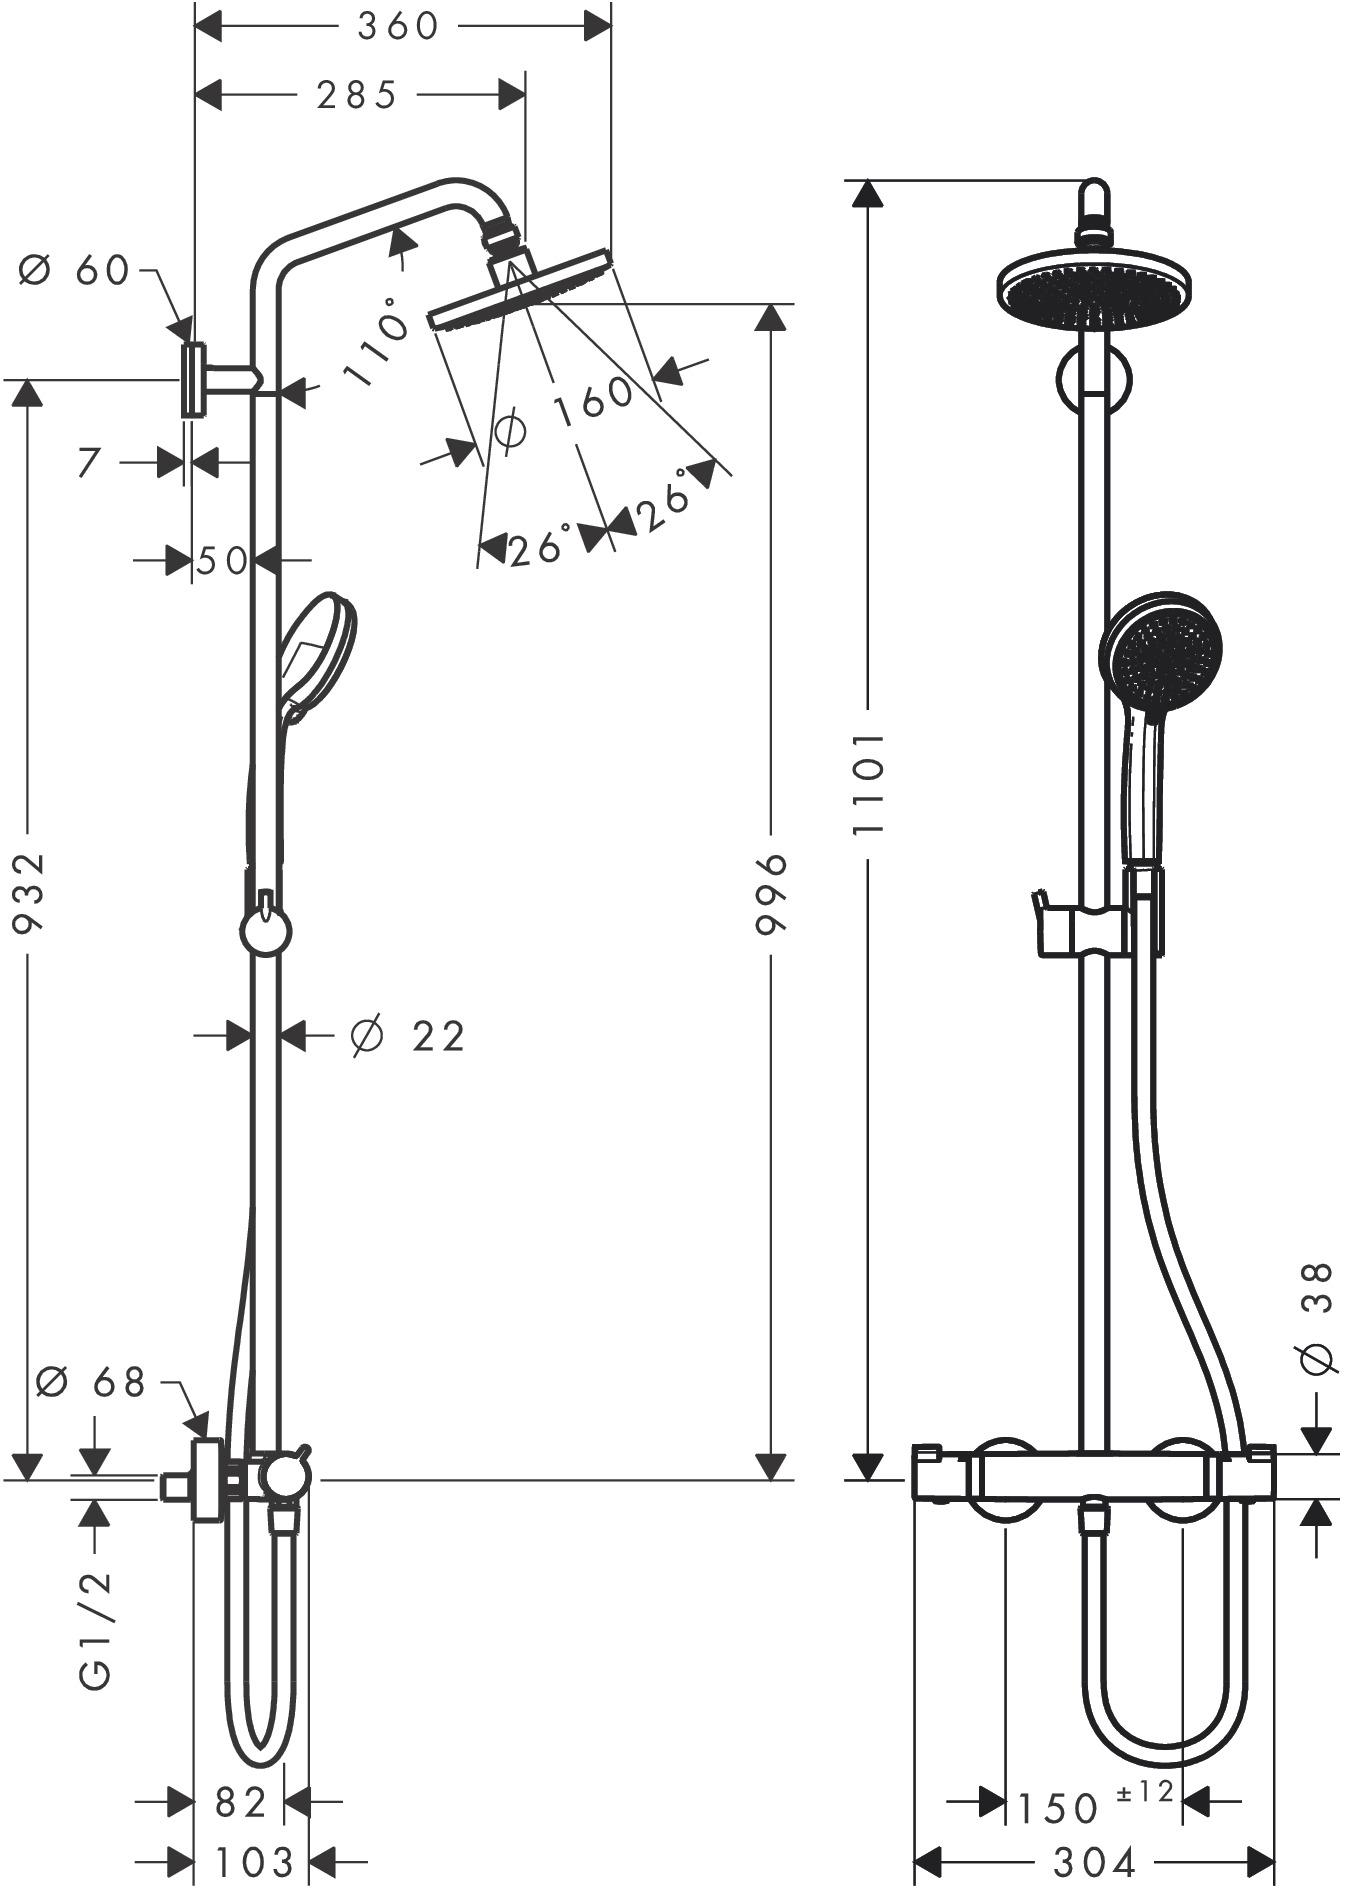 hansgrohe showerpipes croma 1 strahlart art nr 27135000 hansgrohe de. Black Bedroom Furniture Sets. Home Design Ideas